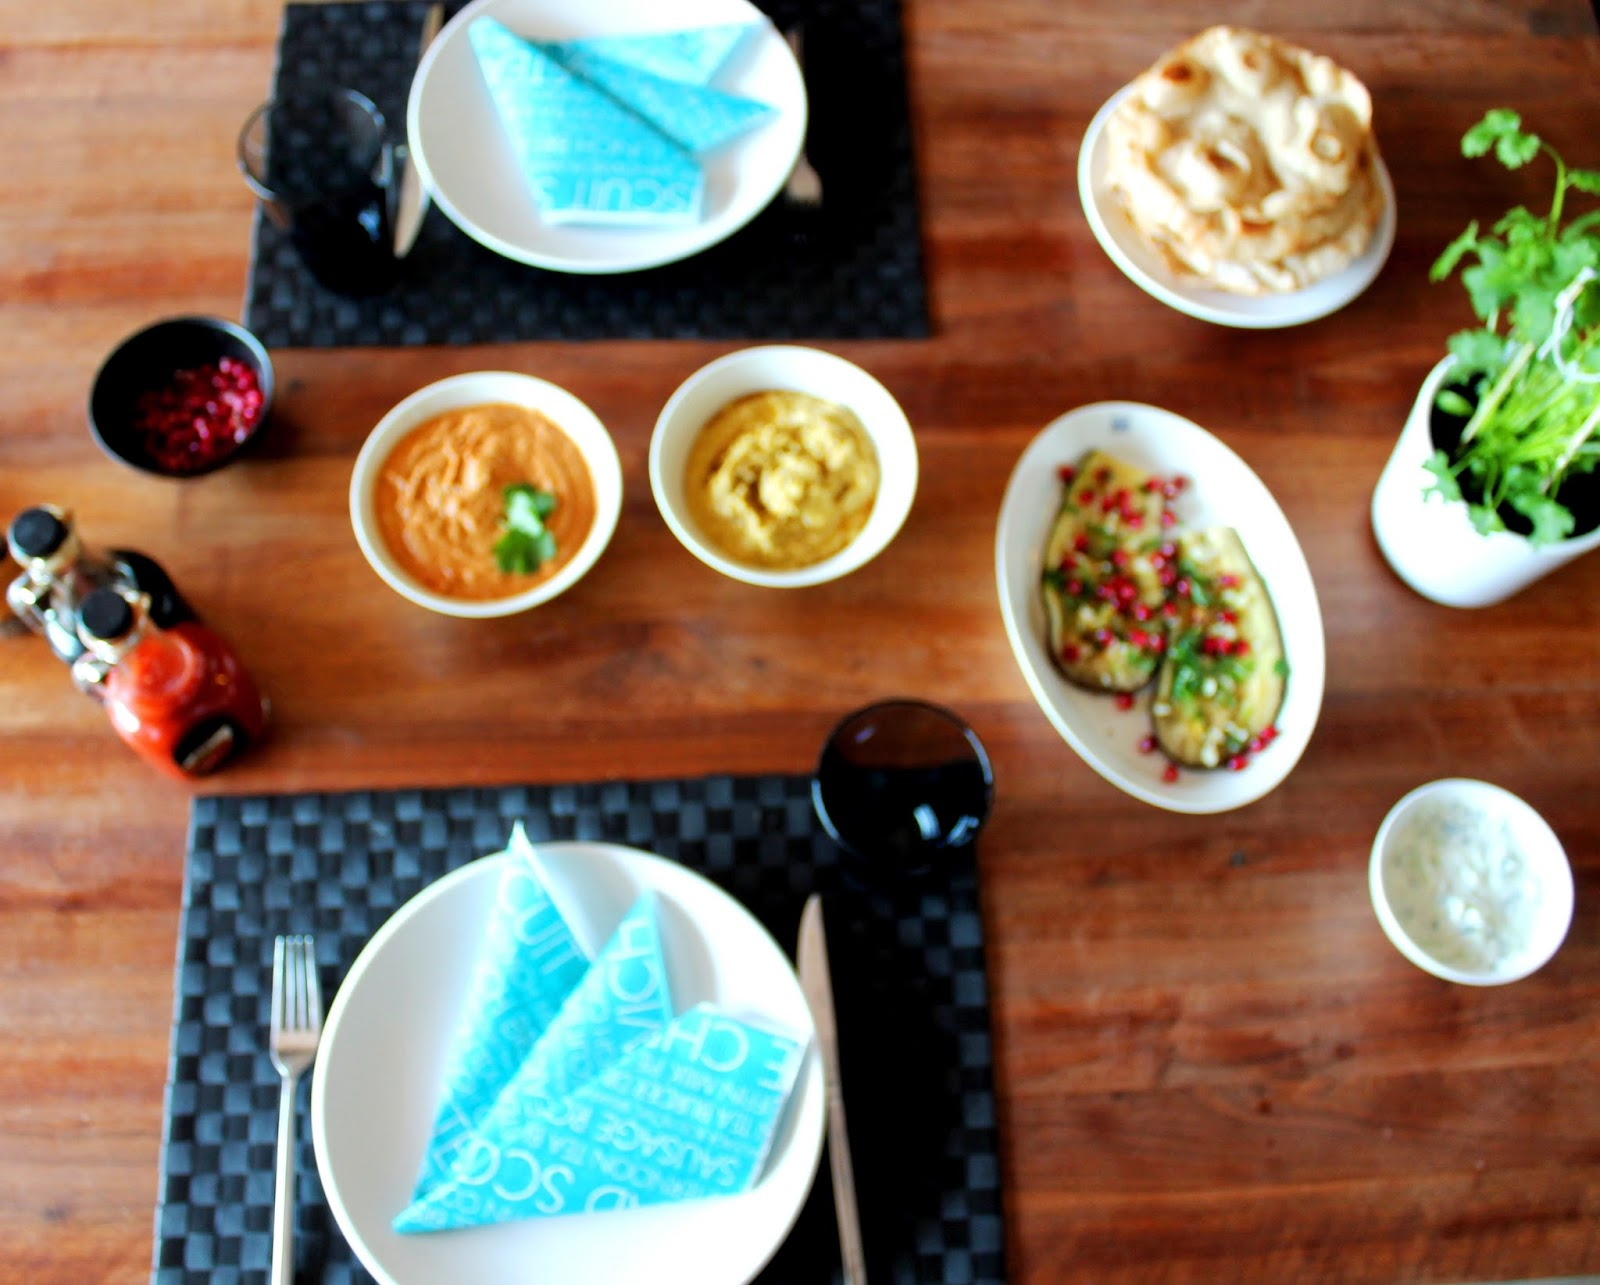 Middle East styled food | Alinan kotona blog